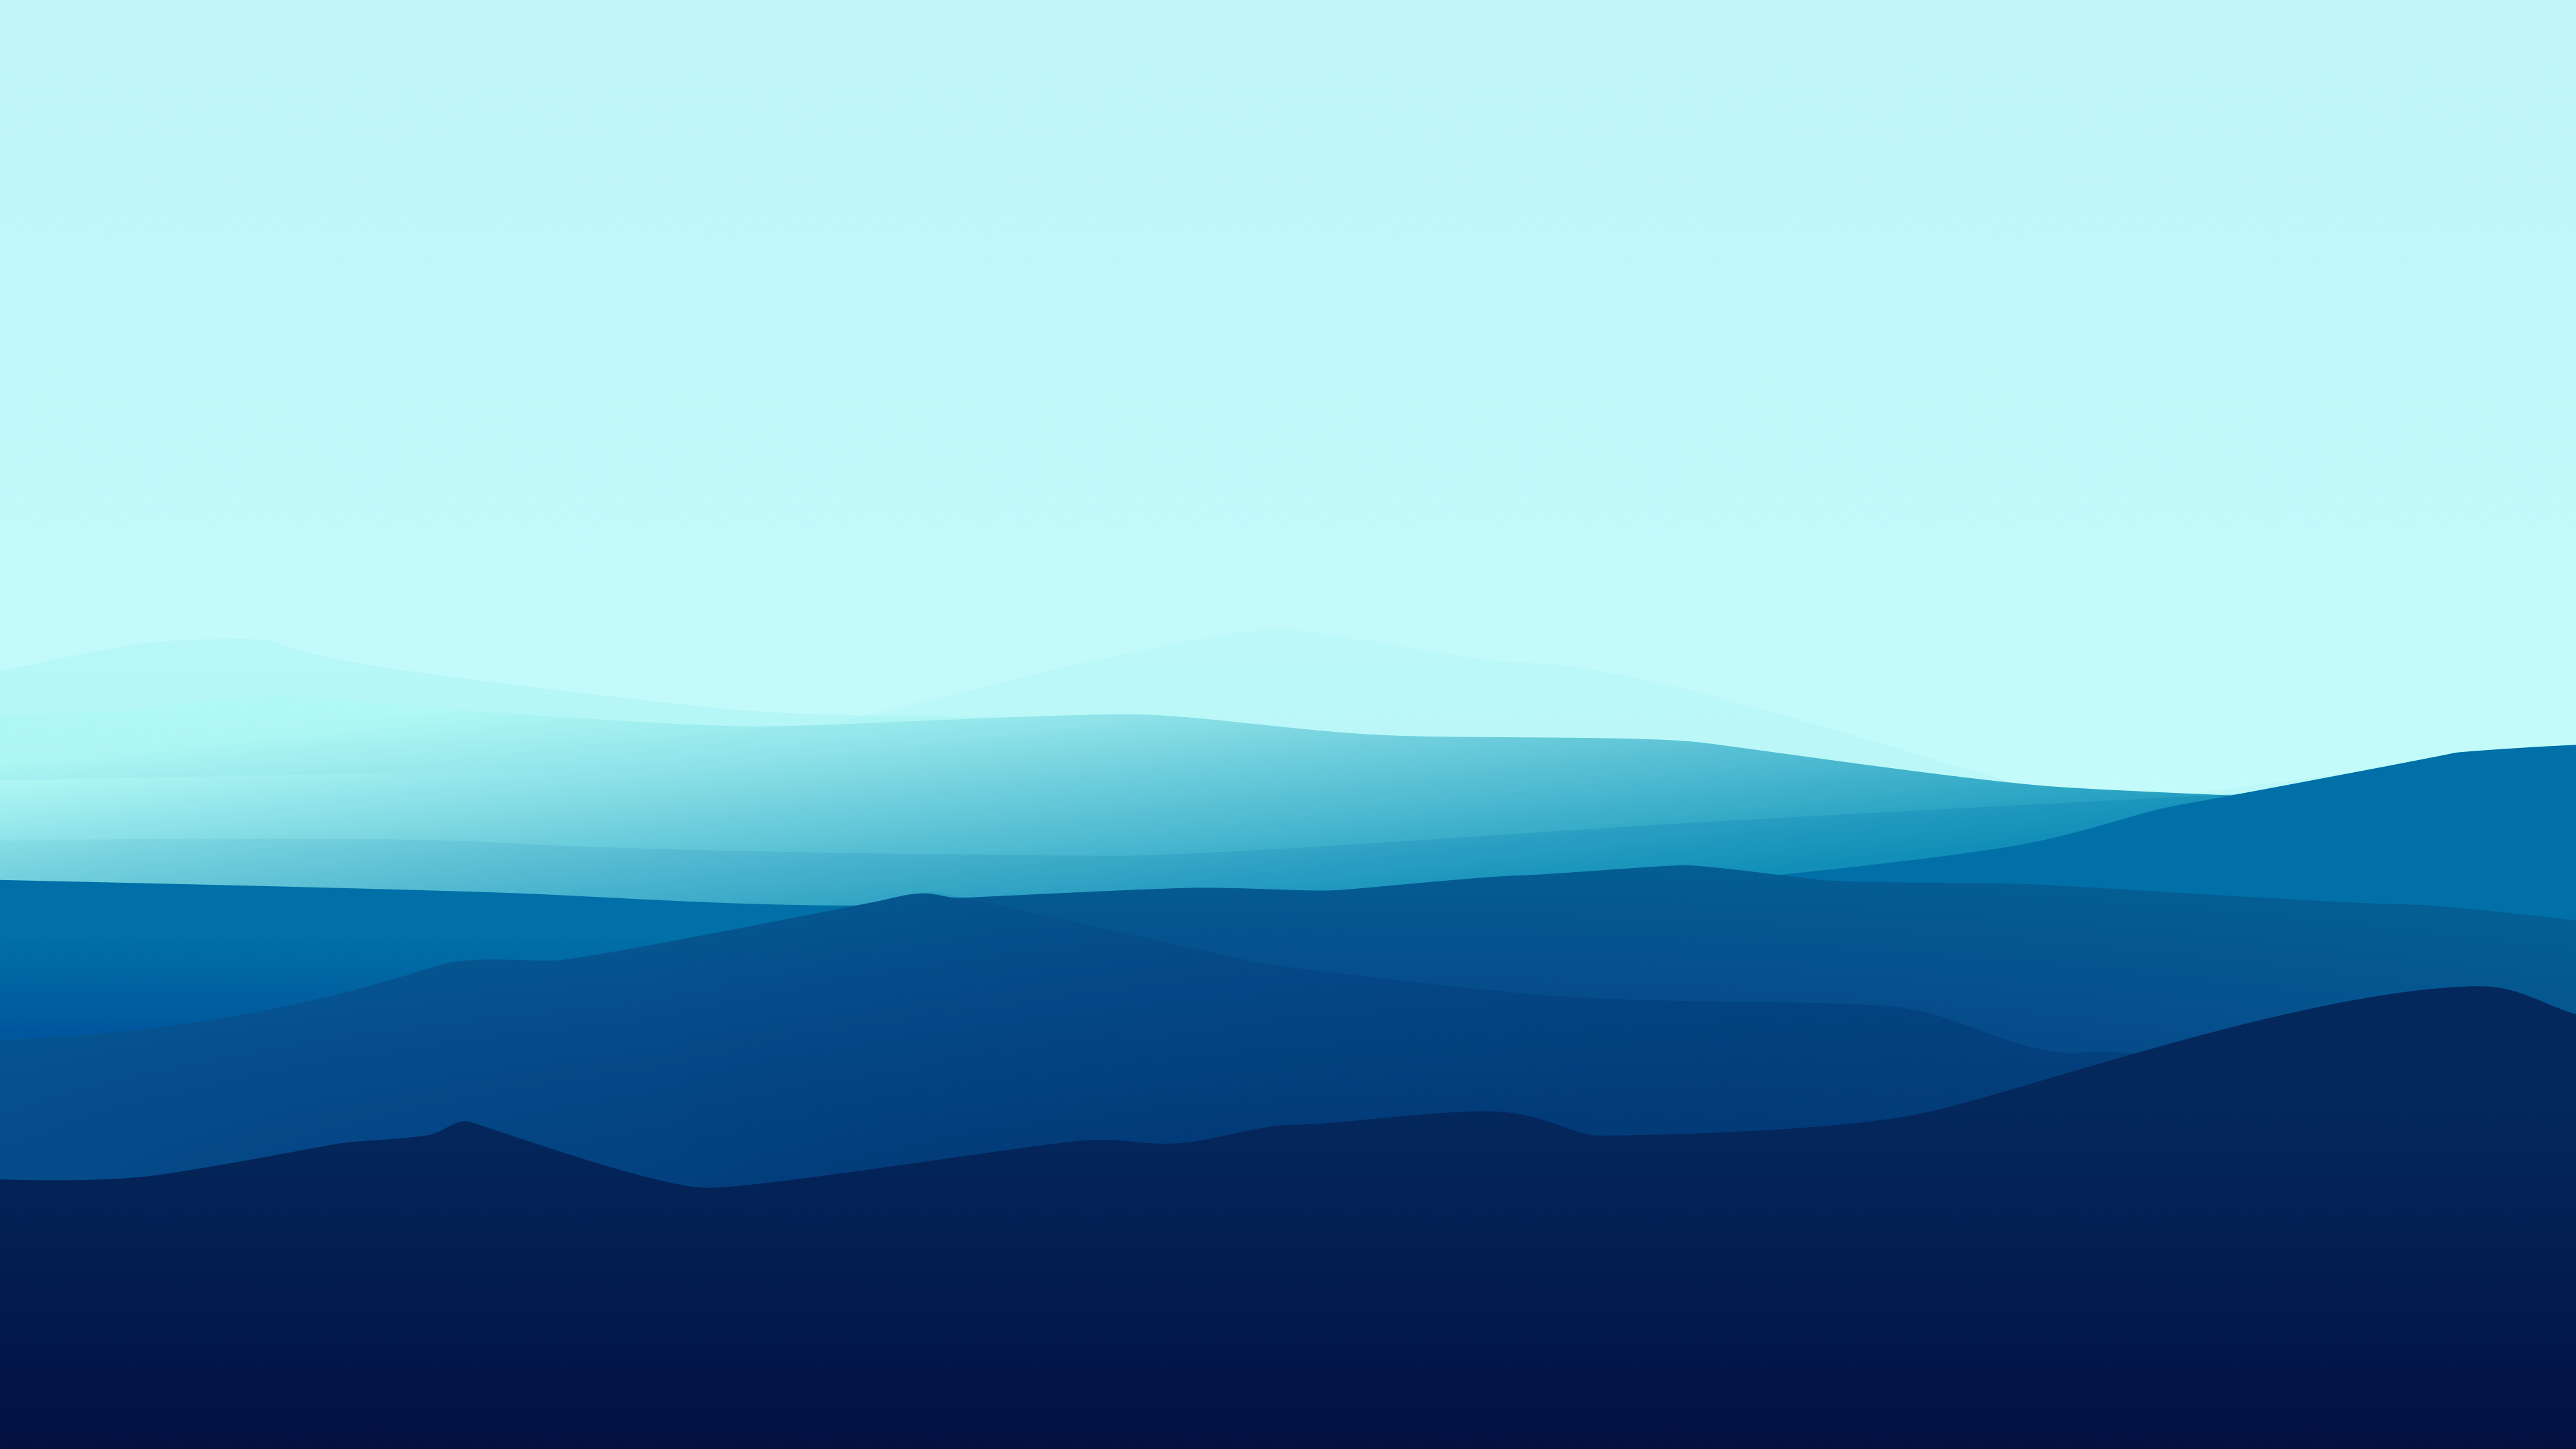 applife-wallpaper-minimalism15